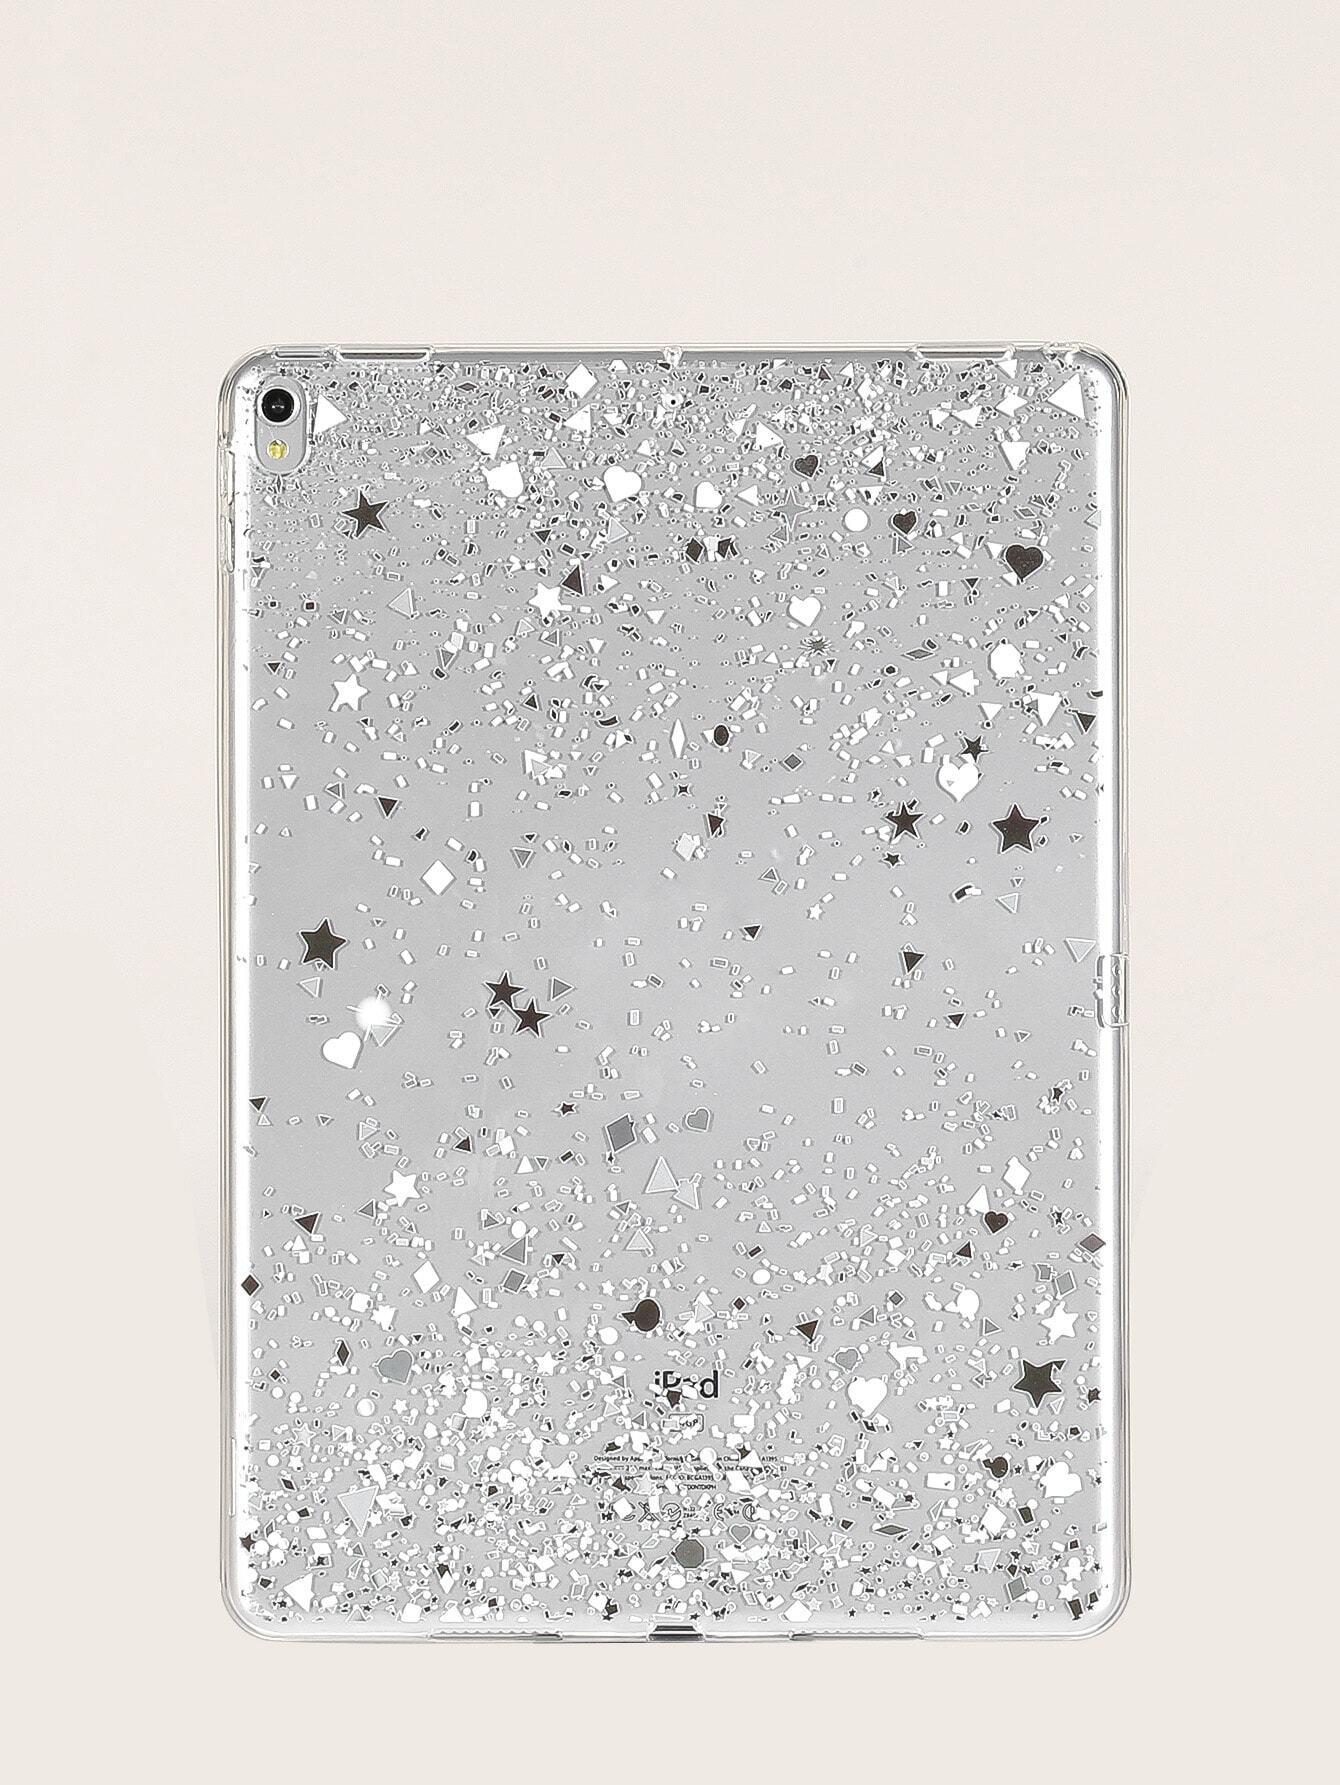 Glitter Transparent iPad Case null